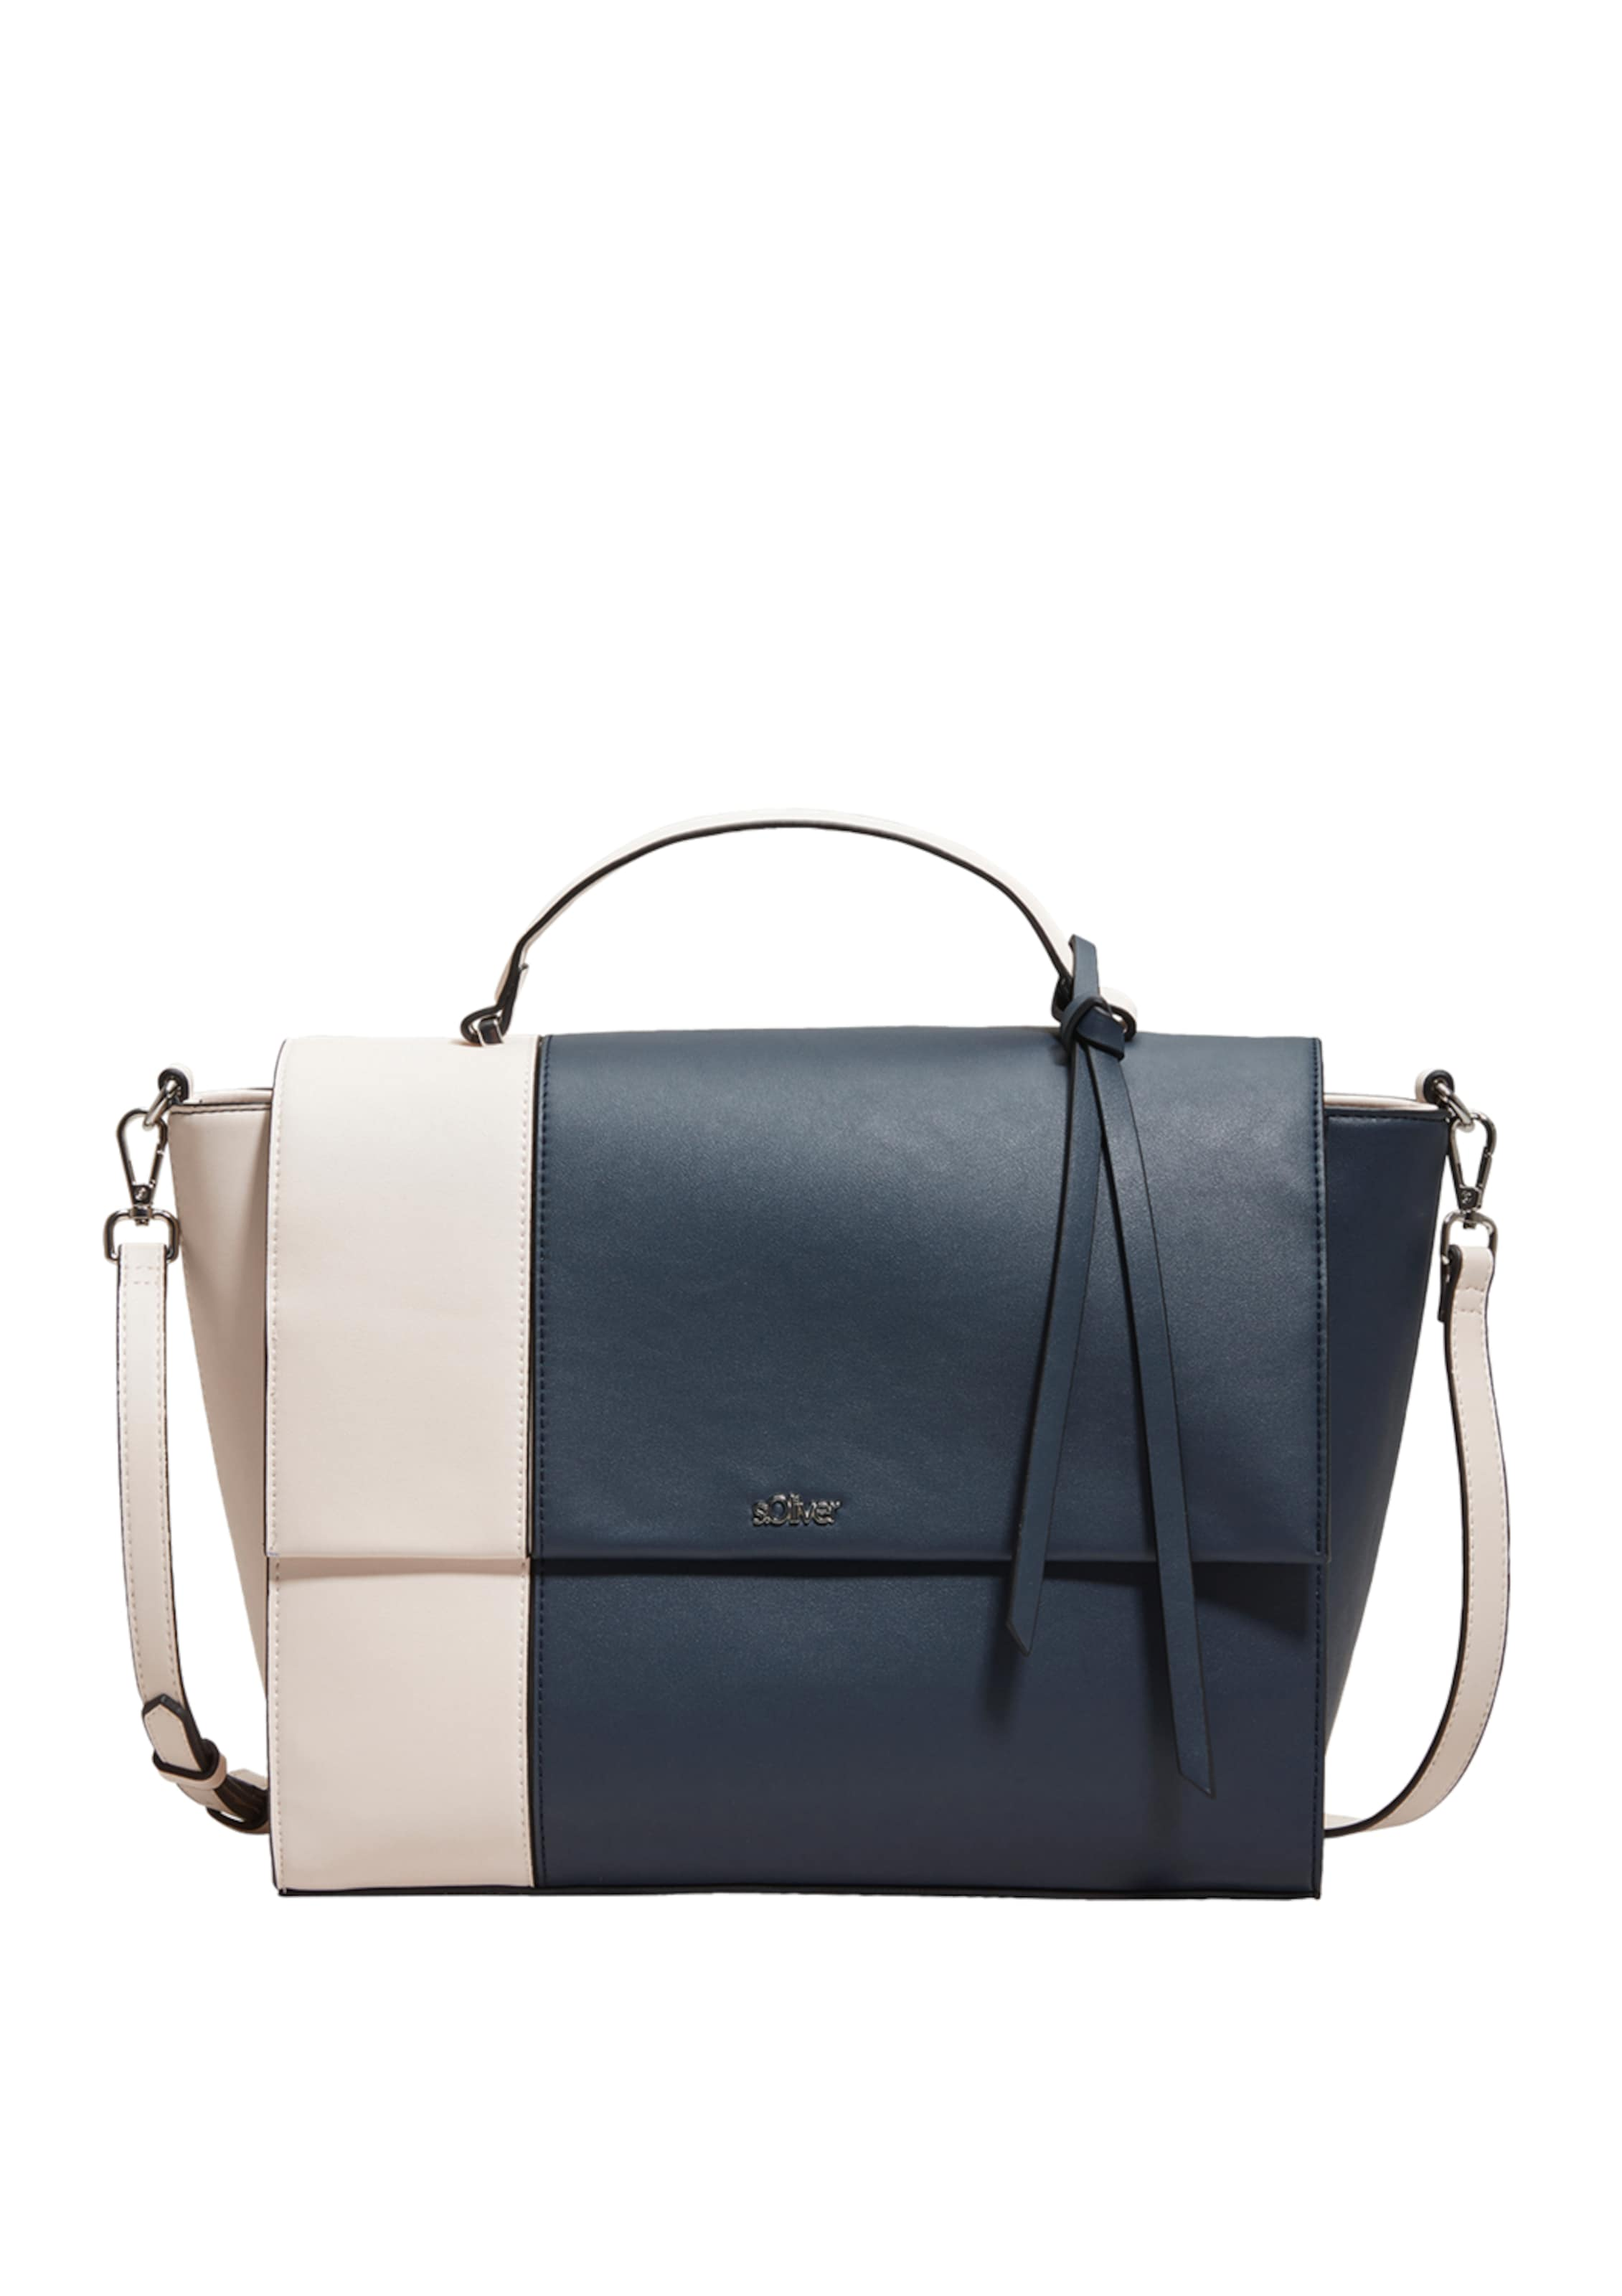 Shoulder Bag S oliver NachtblauRosa Label Red In tohQrxsdCB